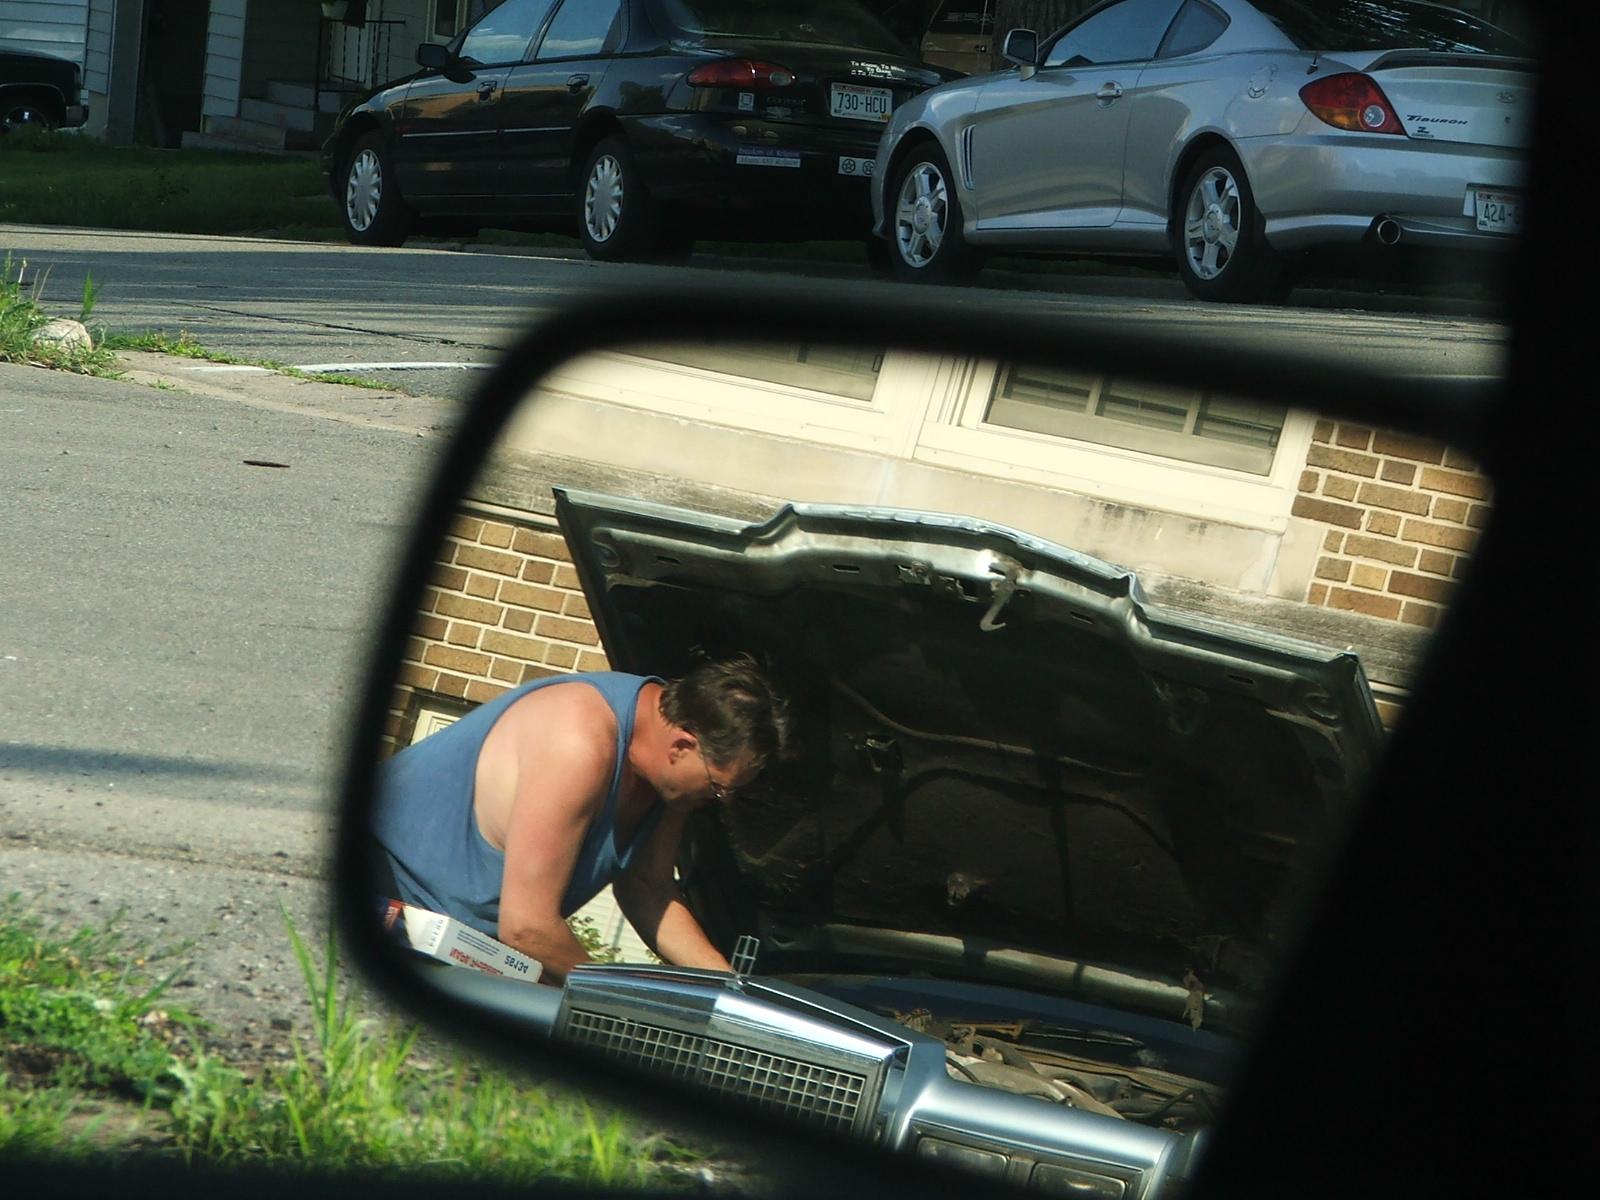 Man fixing Car, Automobile, Broken, Bspo06, Car, HQ Photo